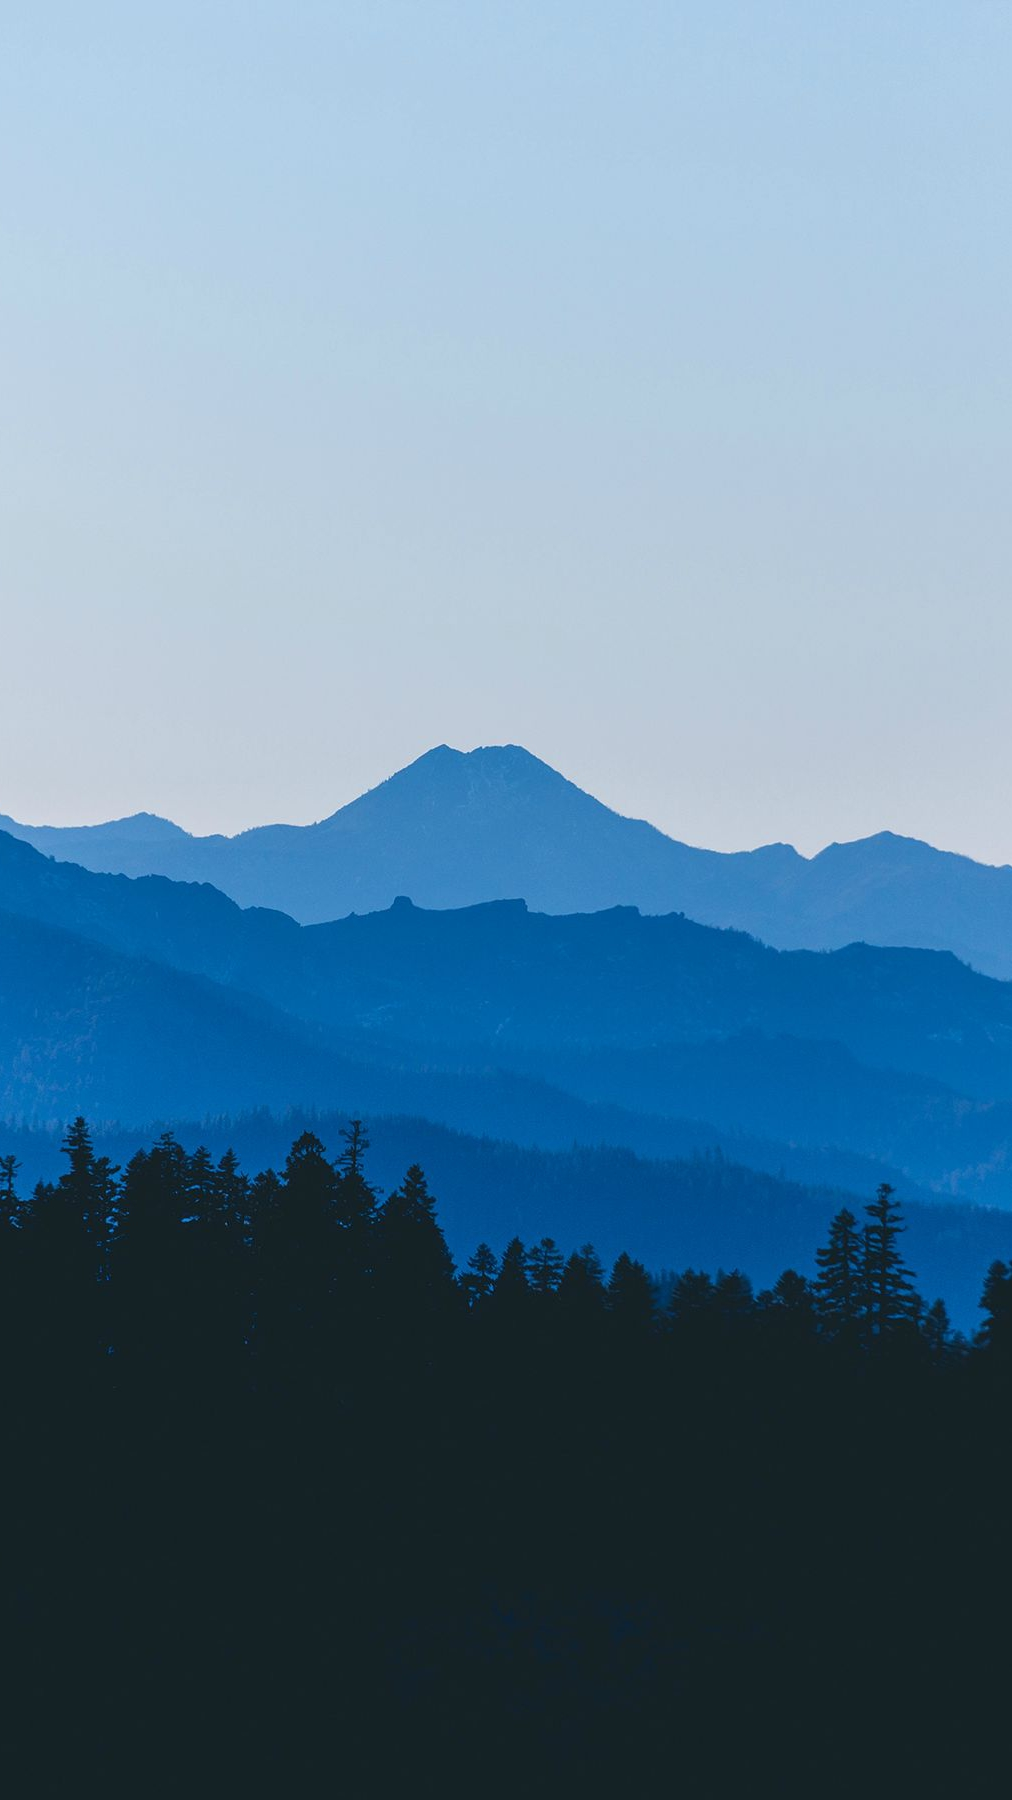 Dark Mountains Fog iPhone Wallpaper iphoneswallpapers com